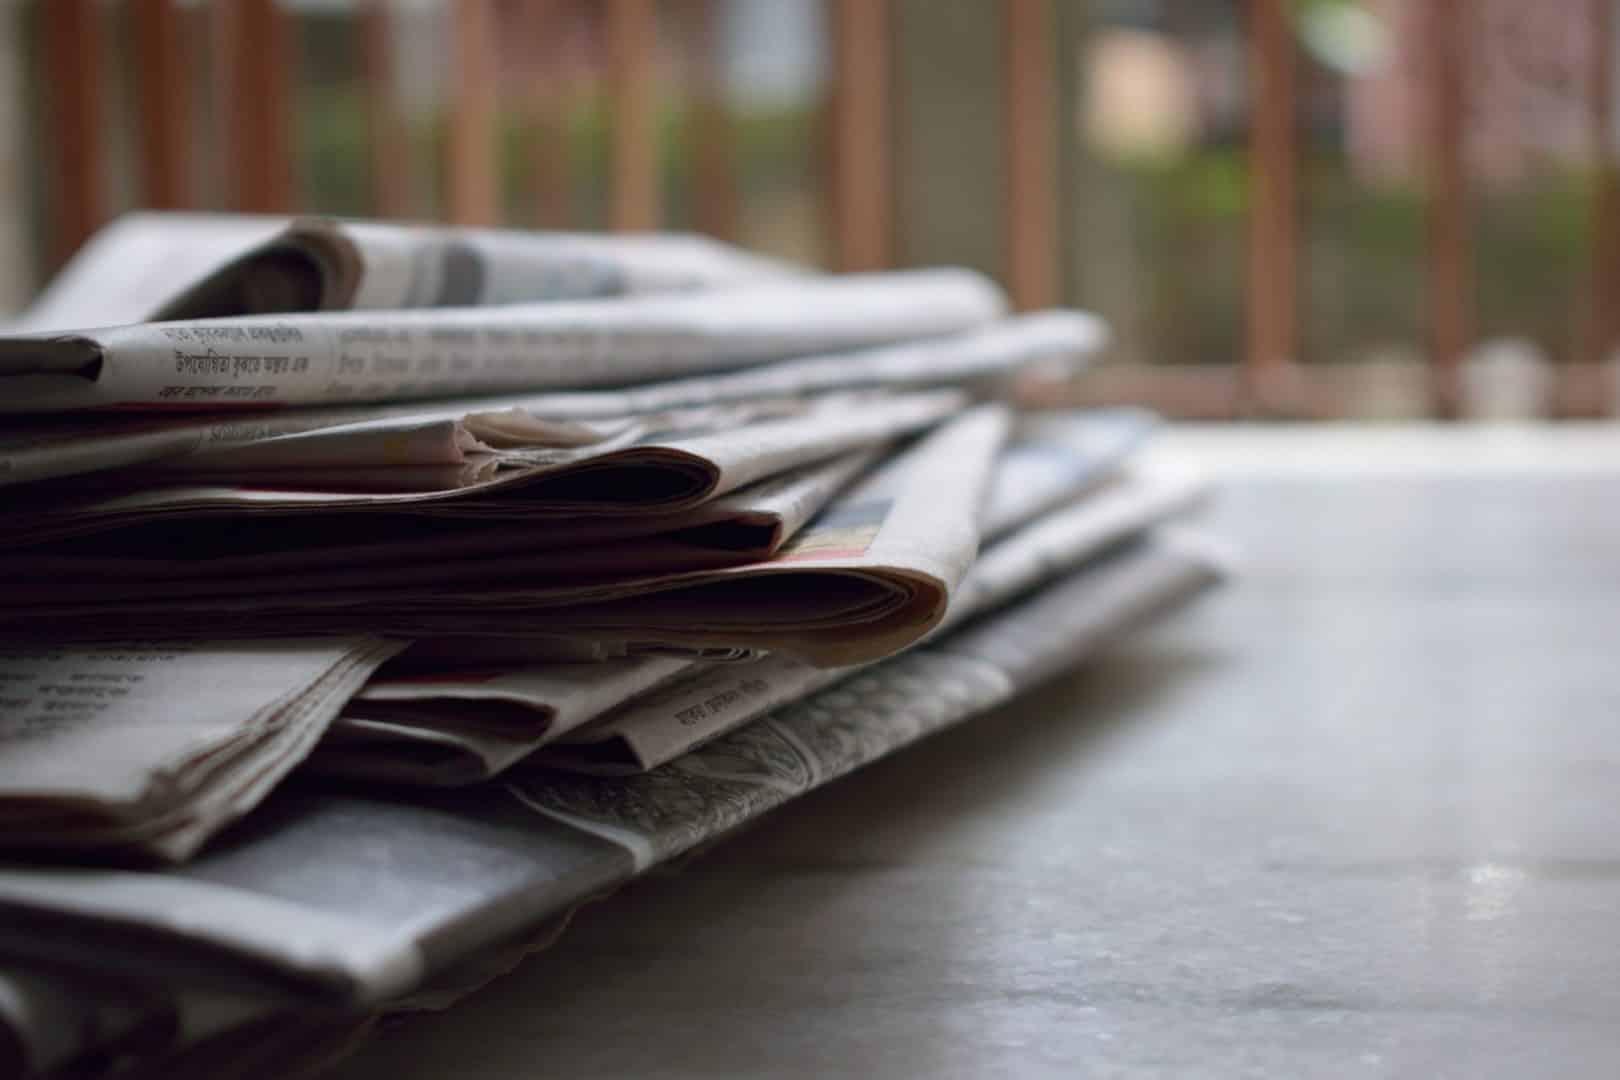 Gezocht parttime redacteur (3-6 uur per week - vrijwilliger)